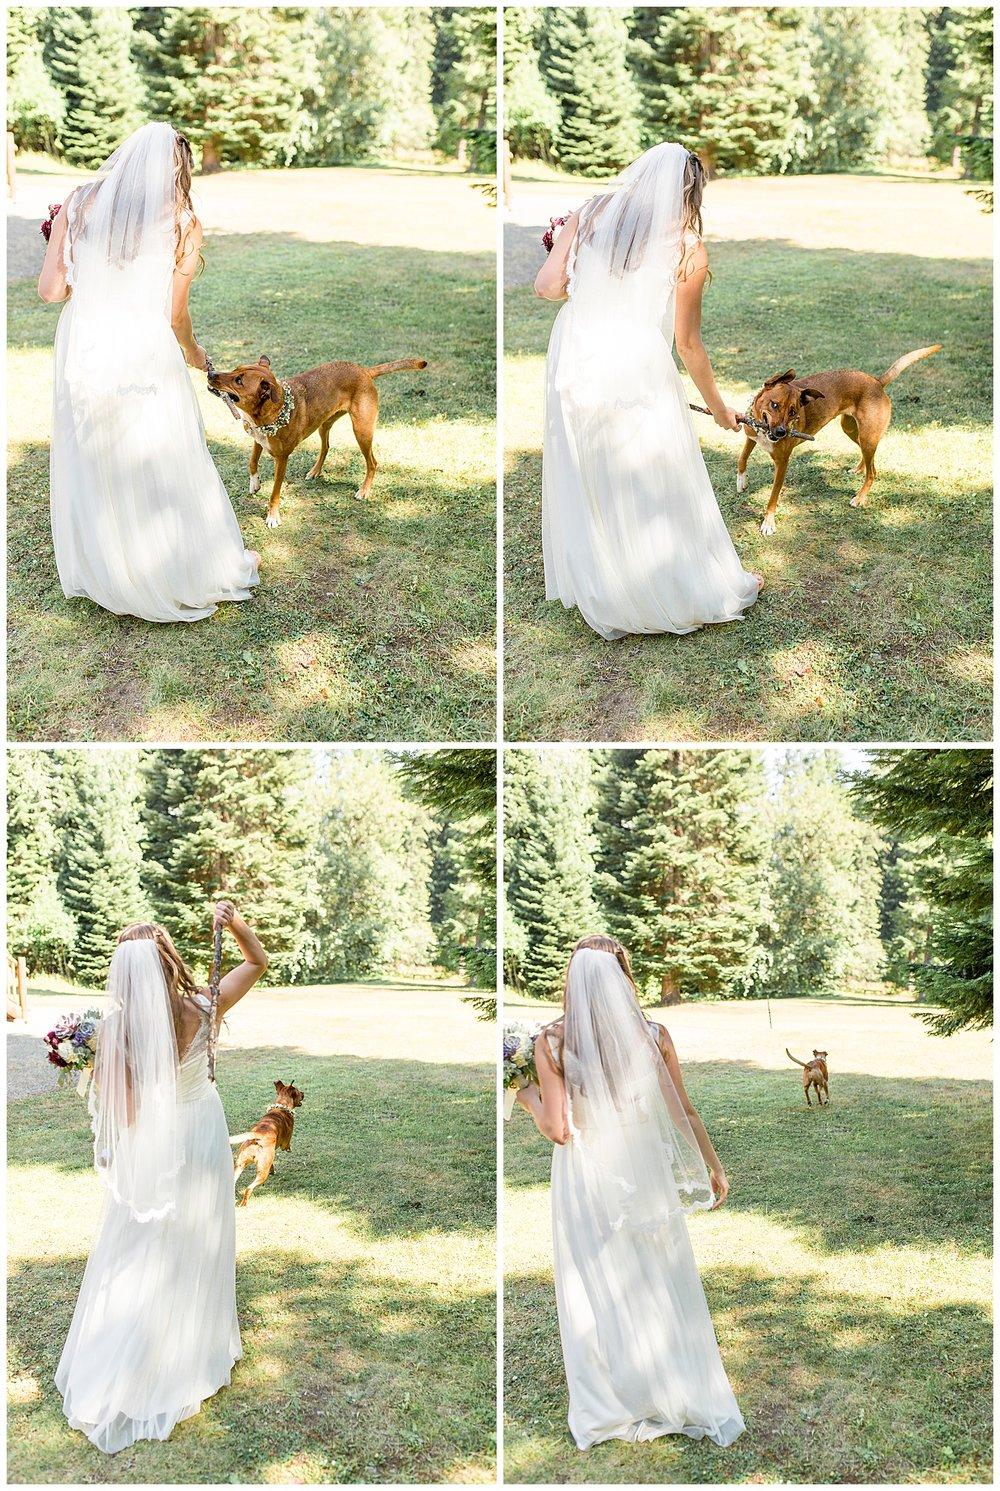 Wedding_Easton_Washington_Whistling_Dixie_Photography_Summer_River_Cabin_0030.jpg